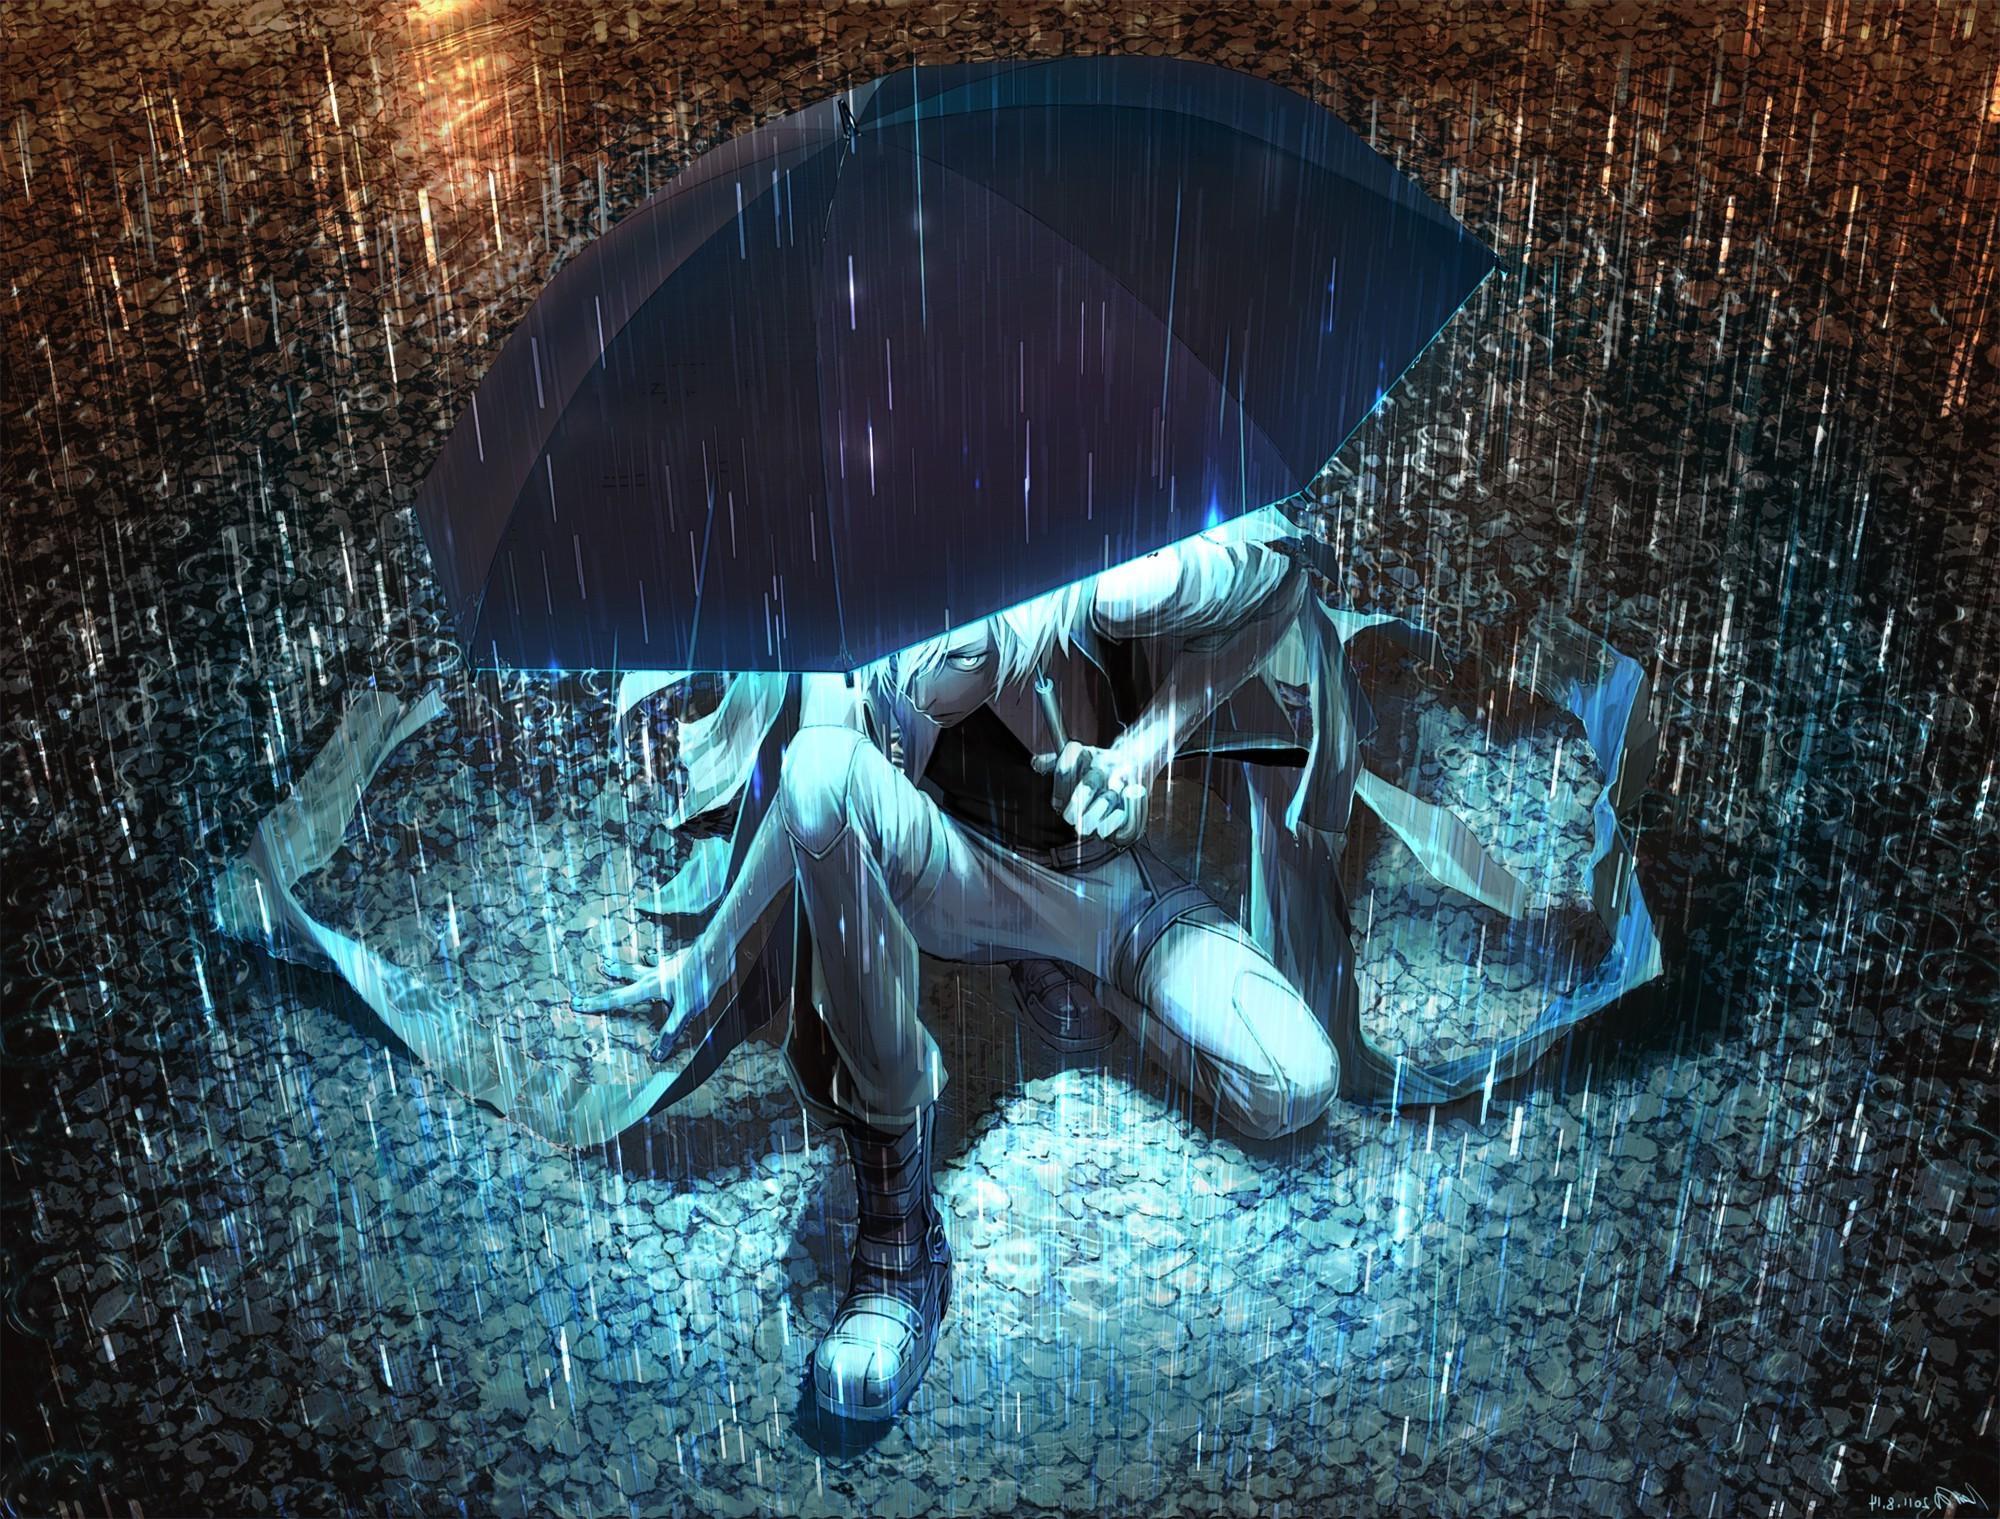 Natsu 3d Wallpapers Umbrella Anime Rain Wallpapers Hd Desktop And Mobile